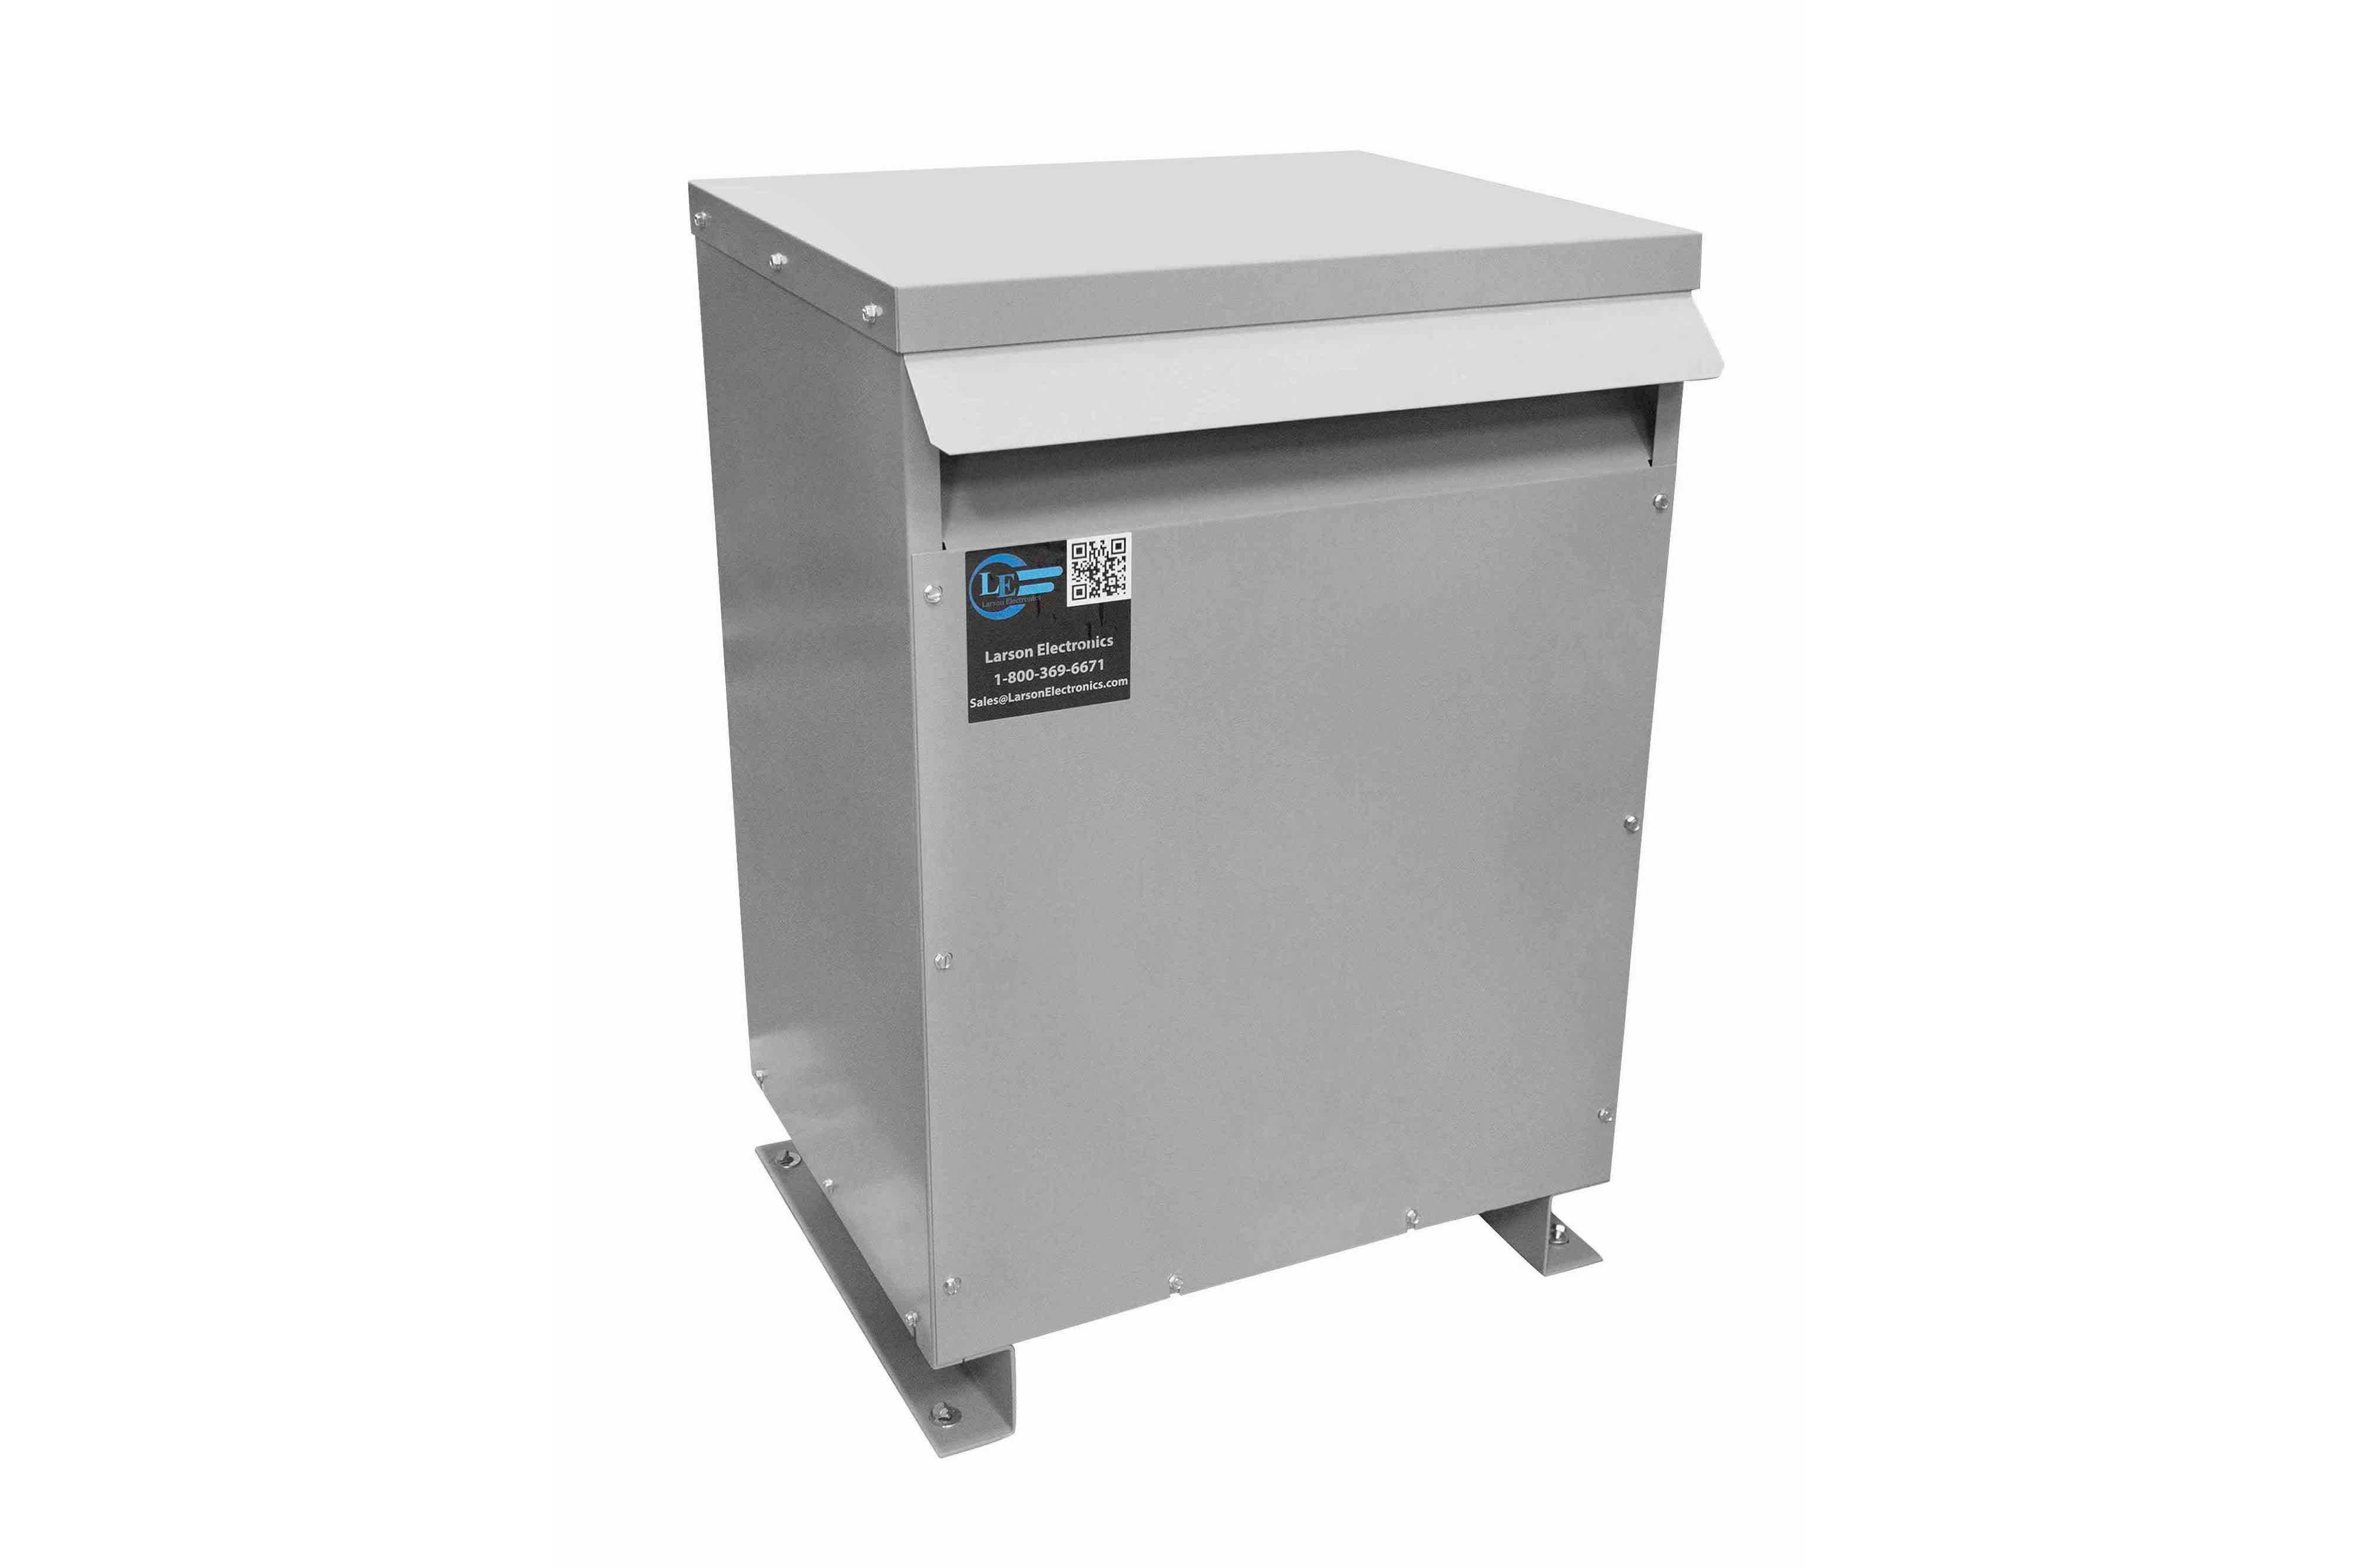 75 kVA 3PH Isolation Transformer, 575V Wye Primary, 240V Delta Secondary, N3R, Ventilated, 60 Hz